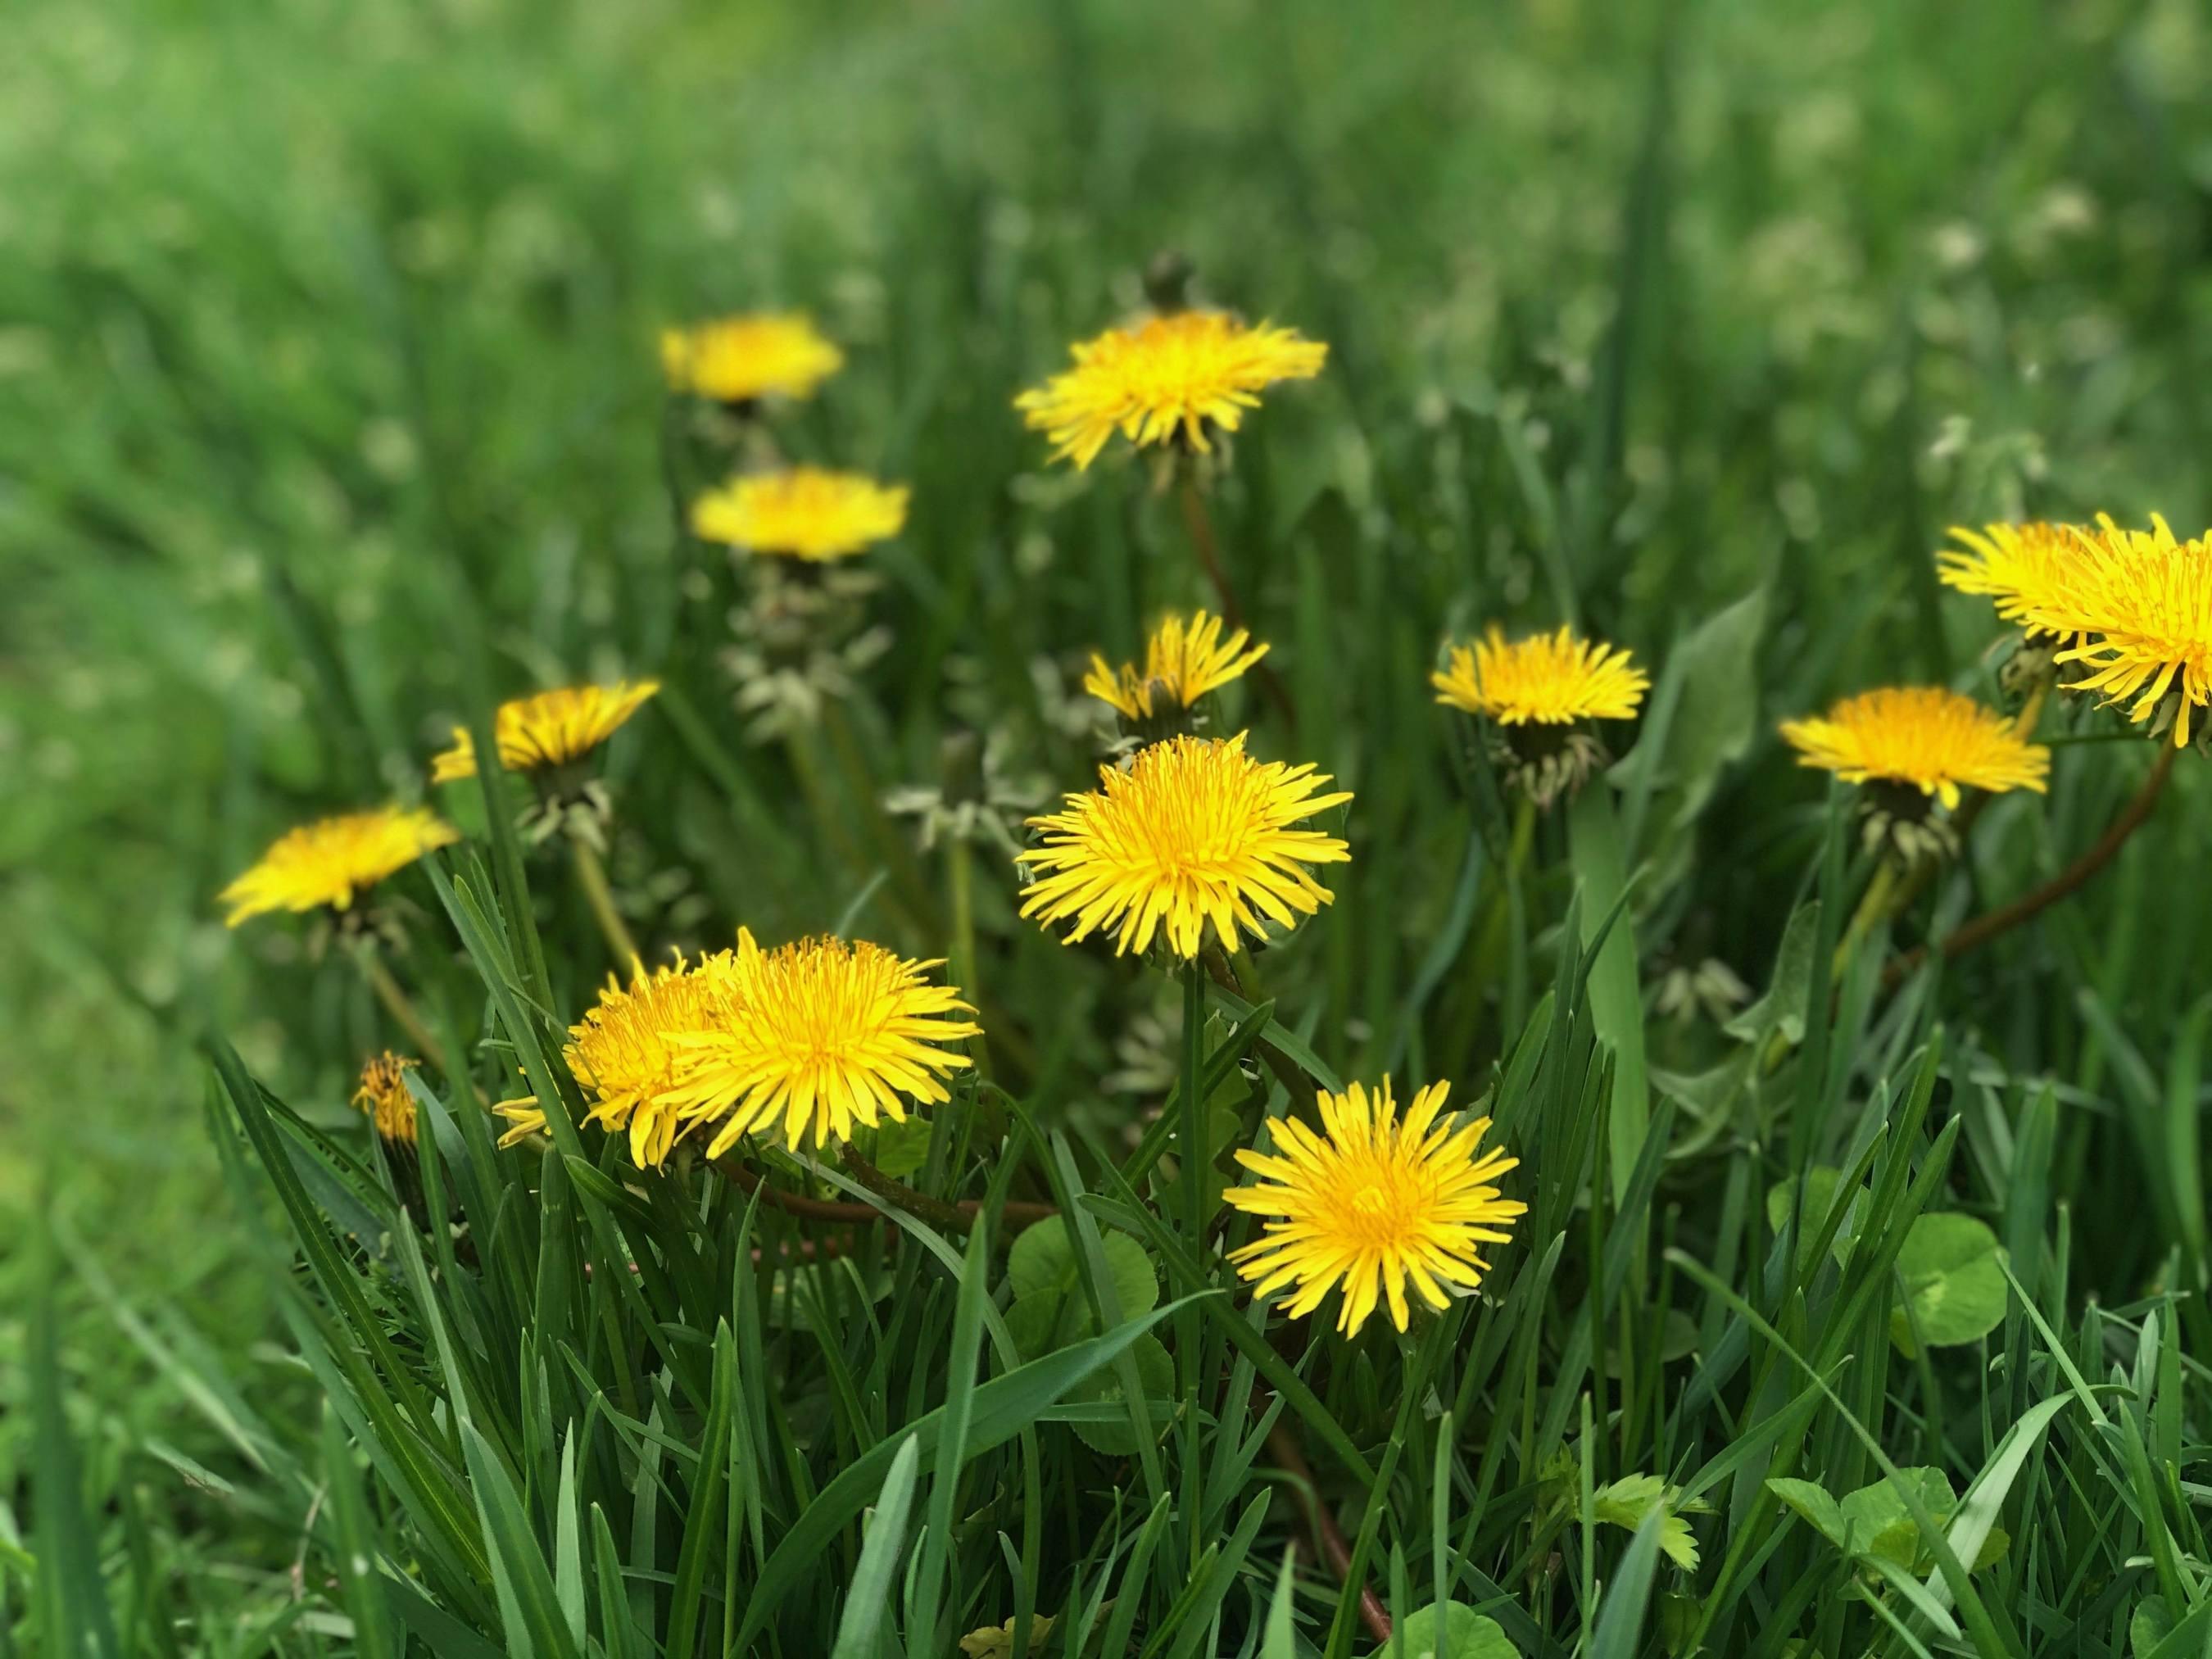 close up of wild dandelions